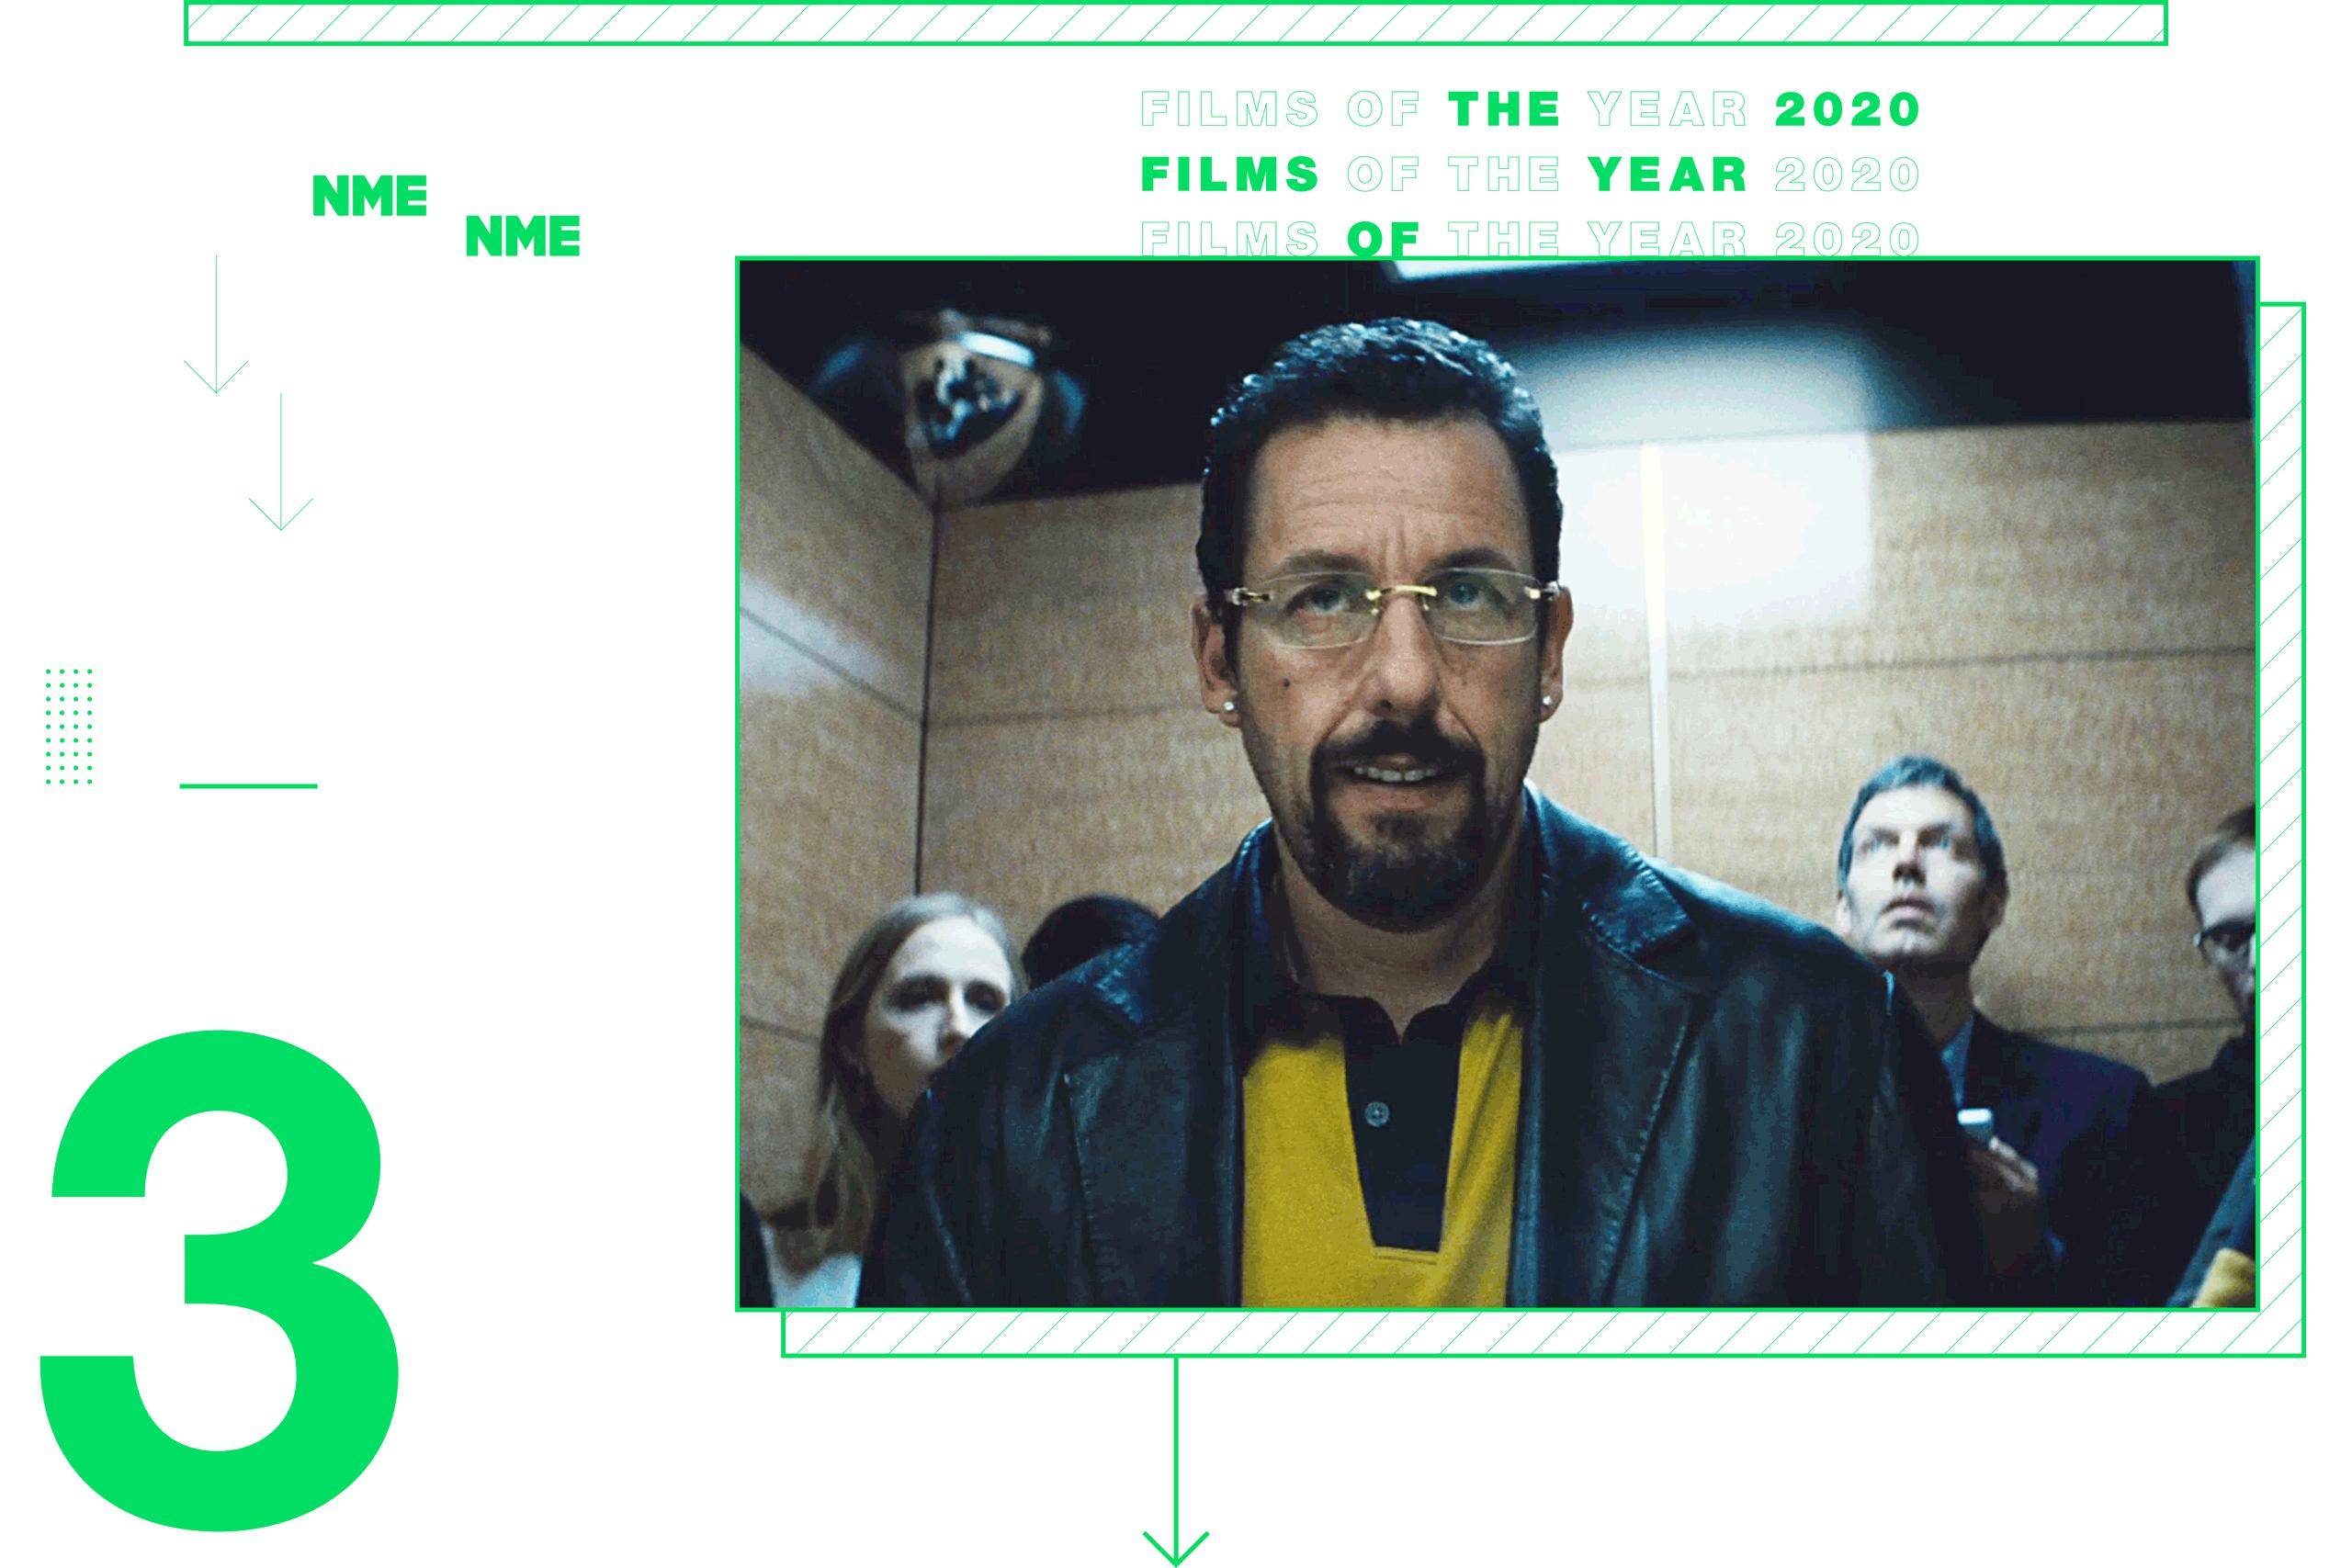 NME Global Films of the Year Uncut Gems